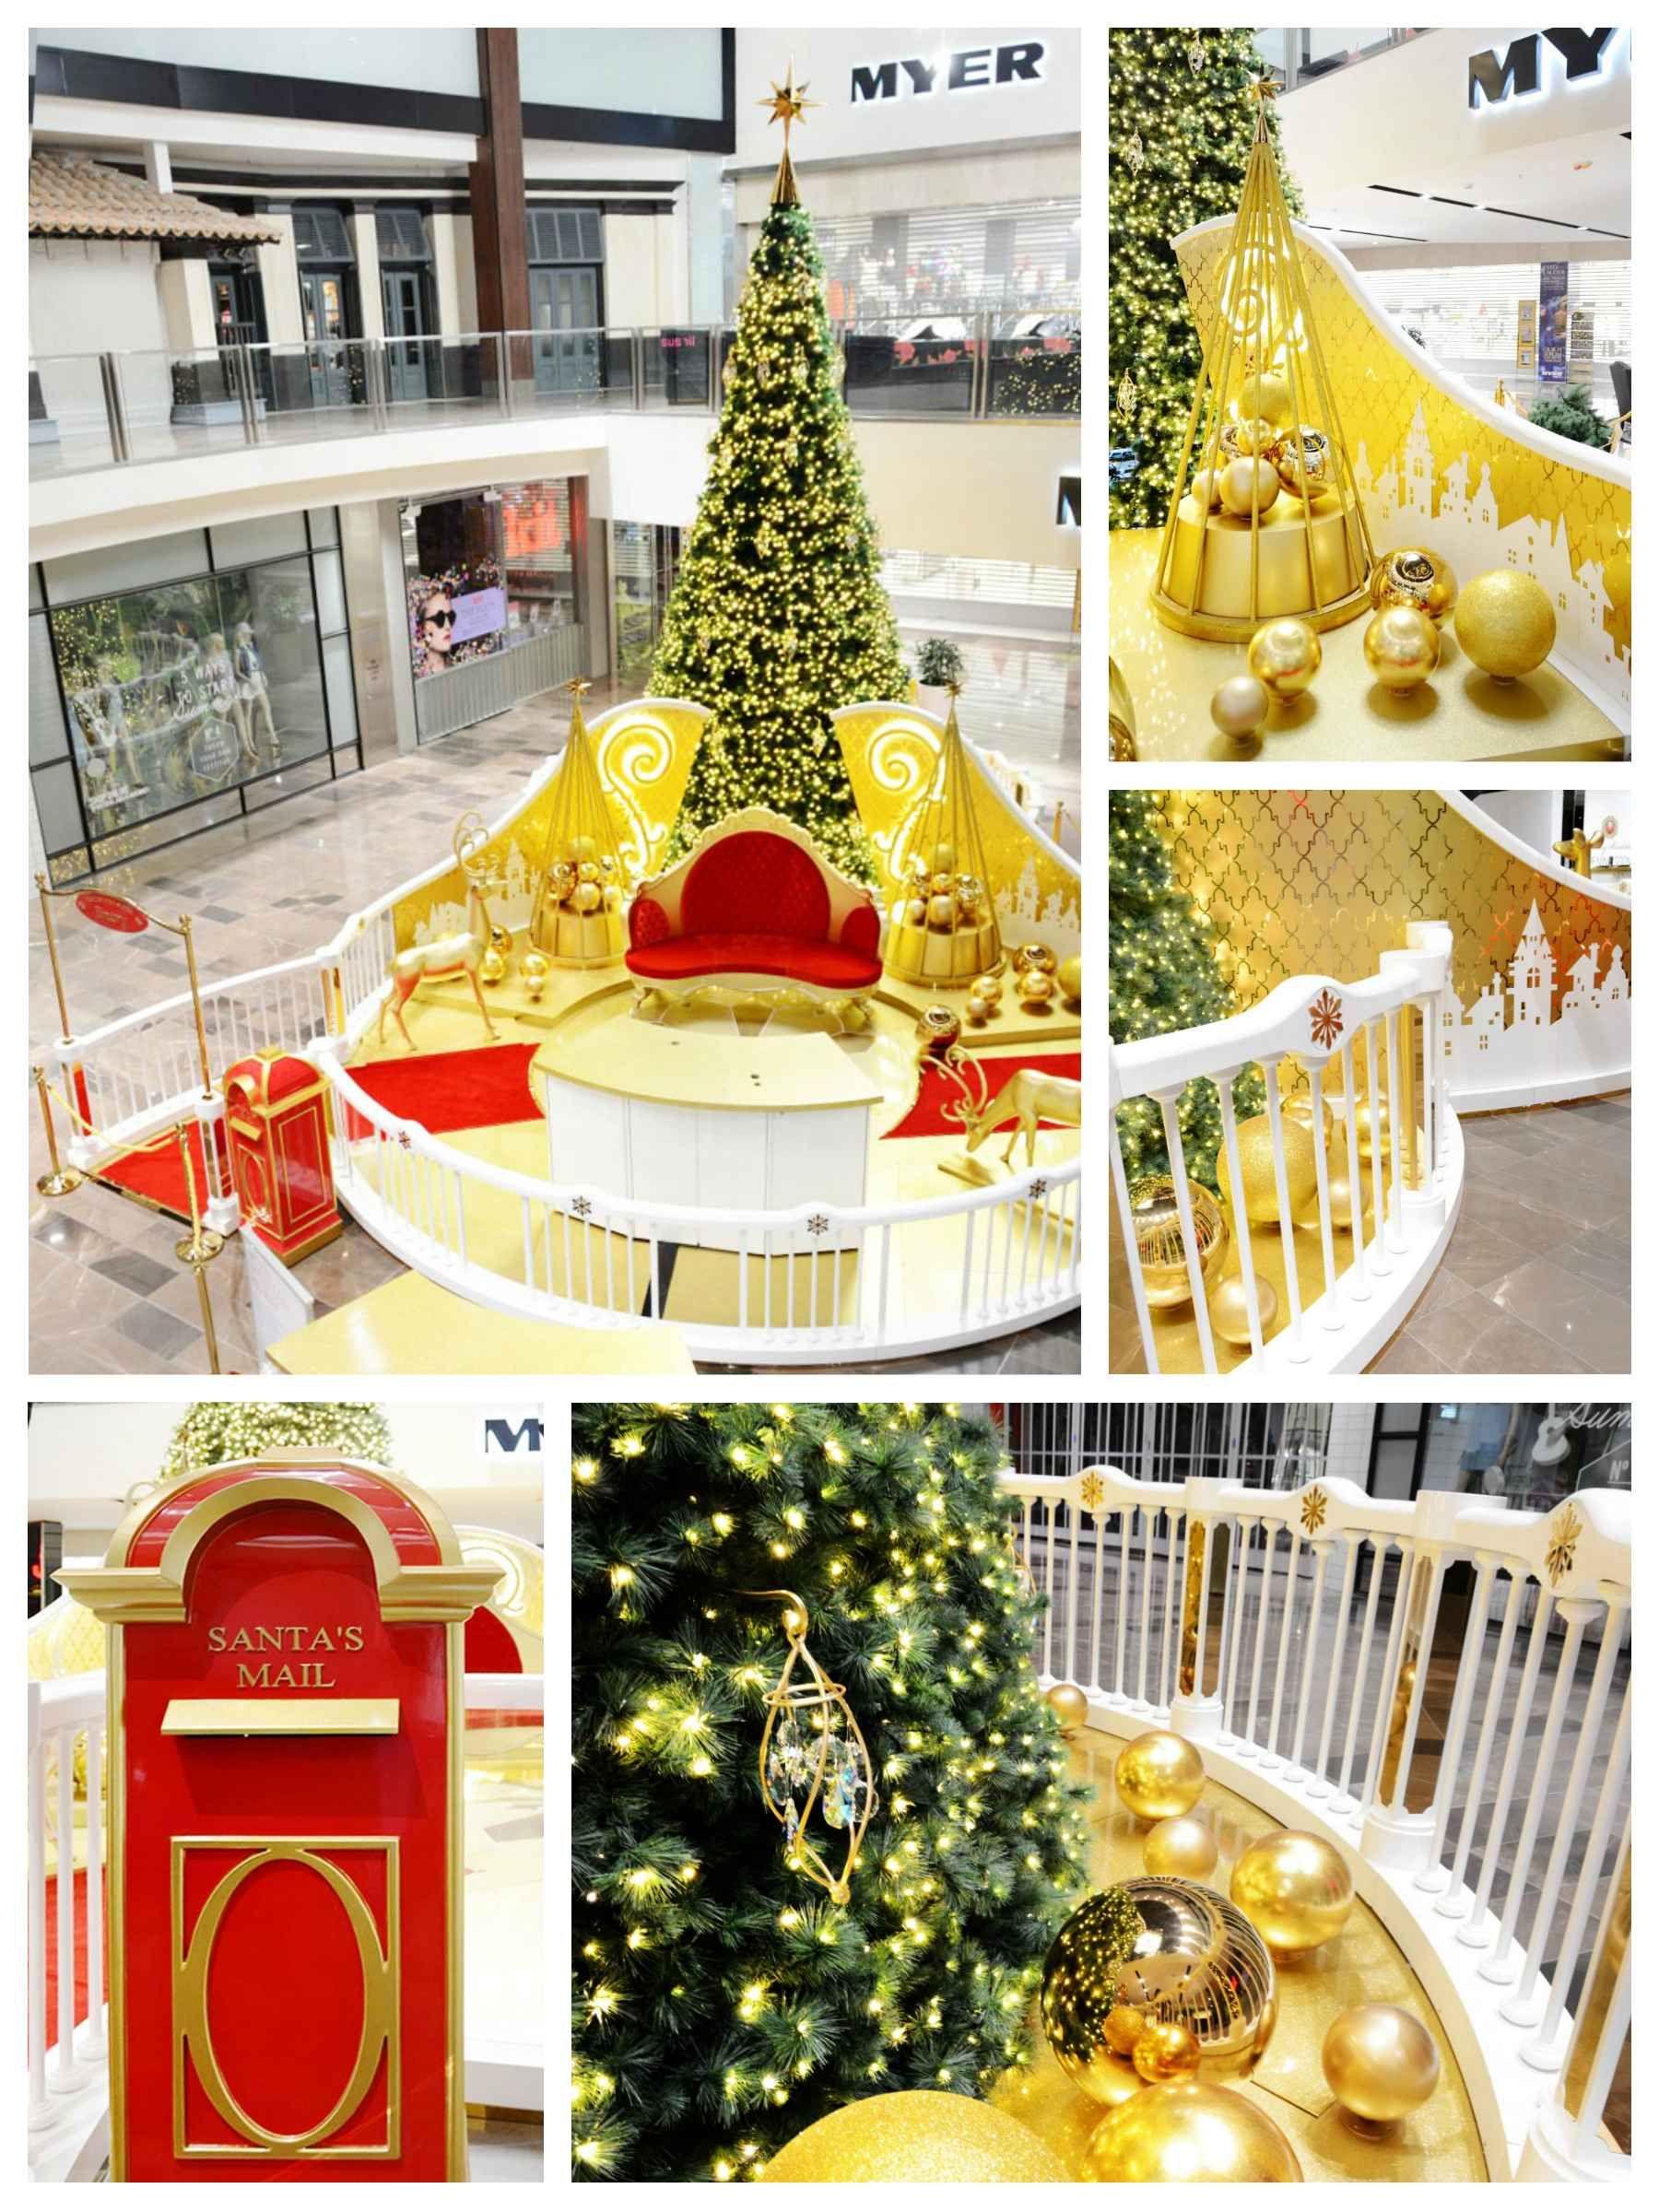 Westfield Doncaster Christmas Decoration Christmas Decorations Christmas Deco Christmas Decorations 2017